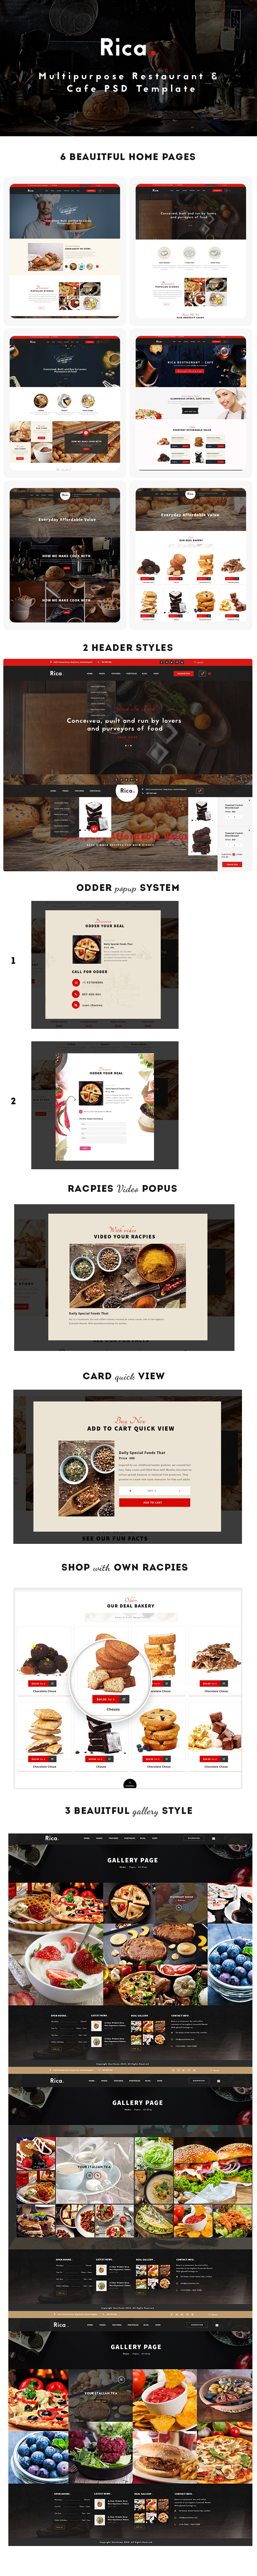 Rica - Multipurpose Restaurant & Cafe PSD Template - 5